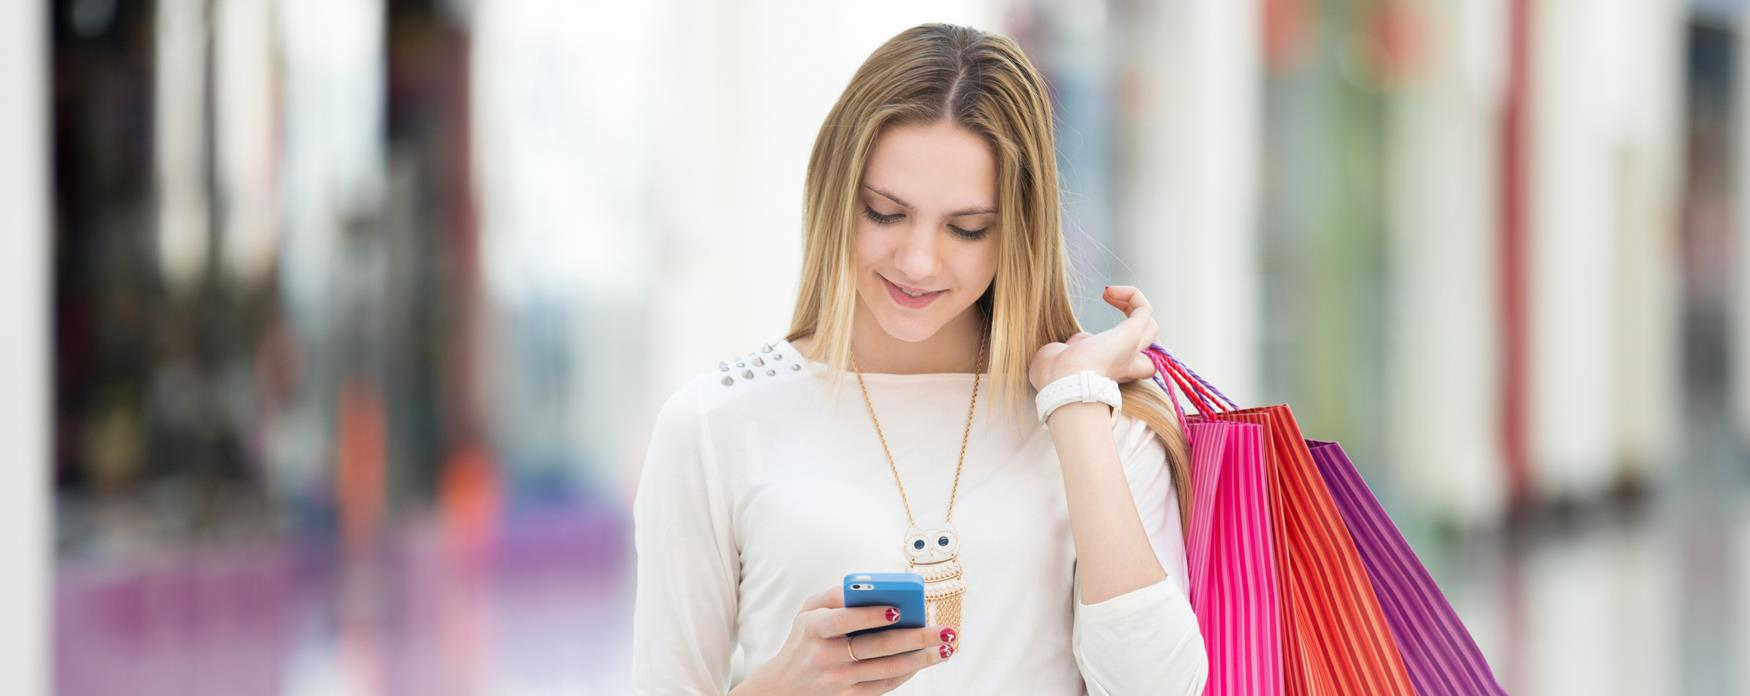 Smiley Girl on phone shopping